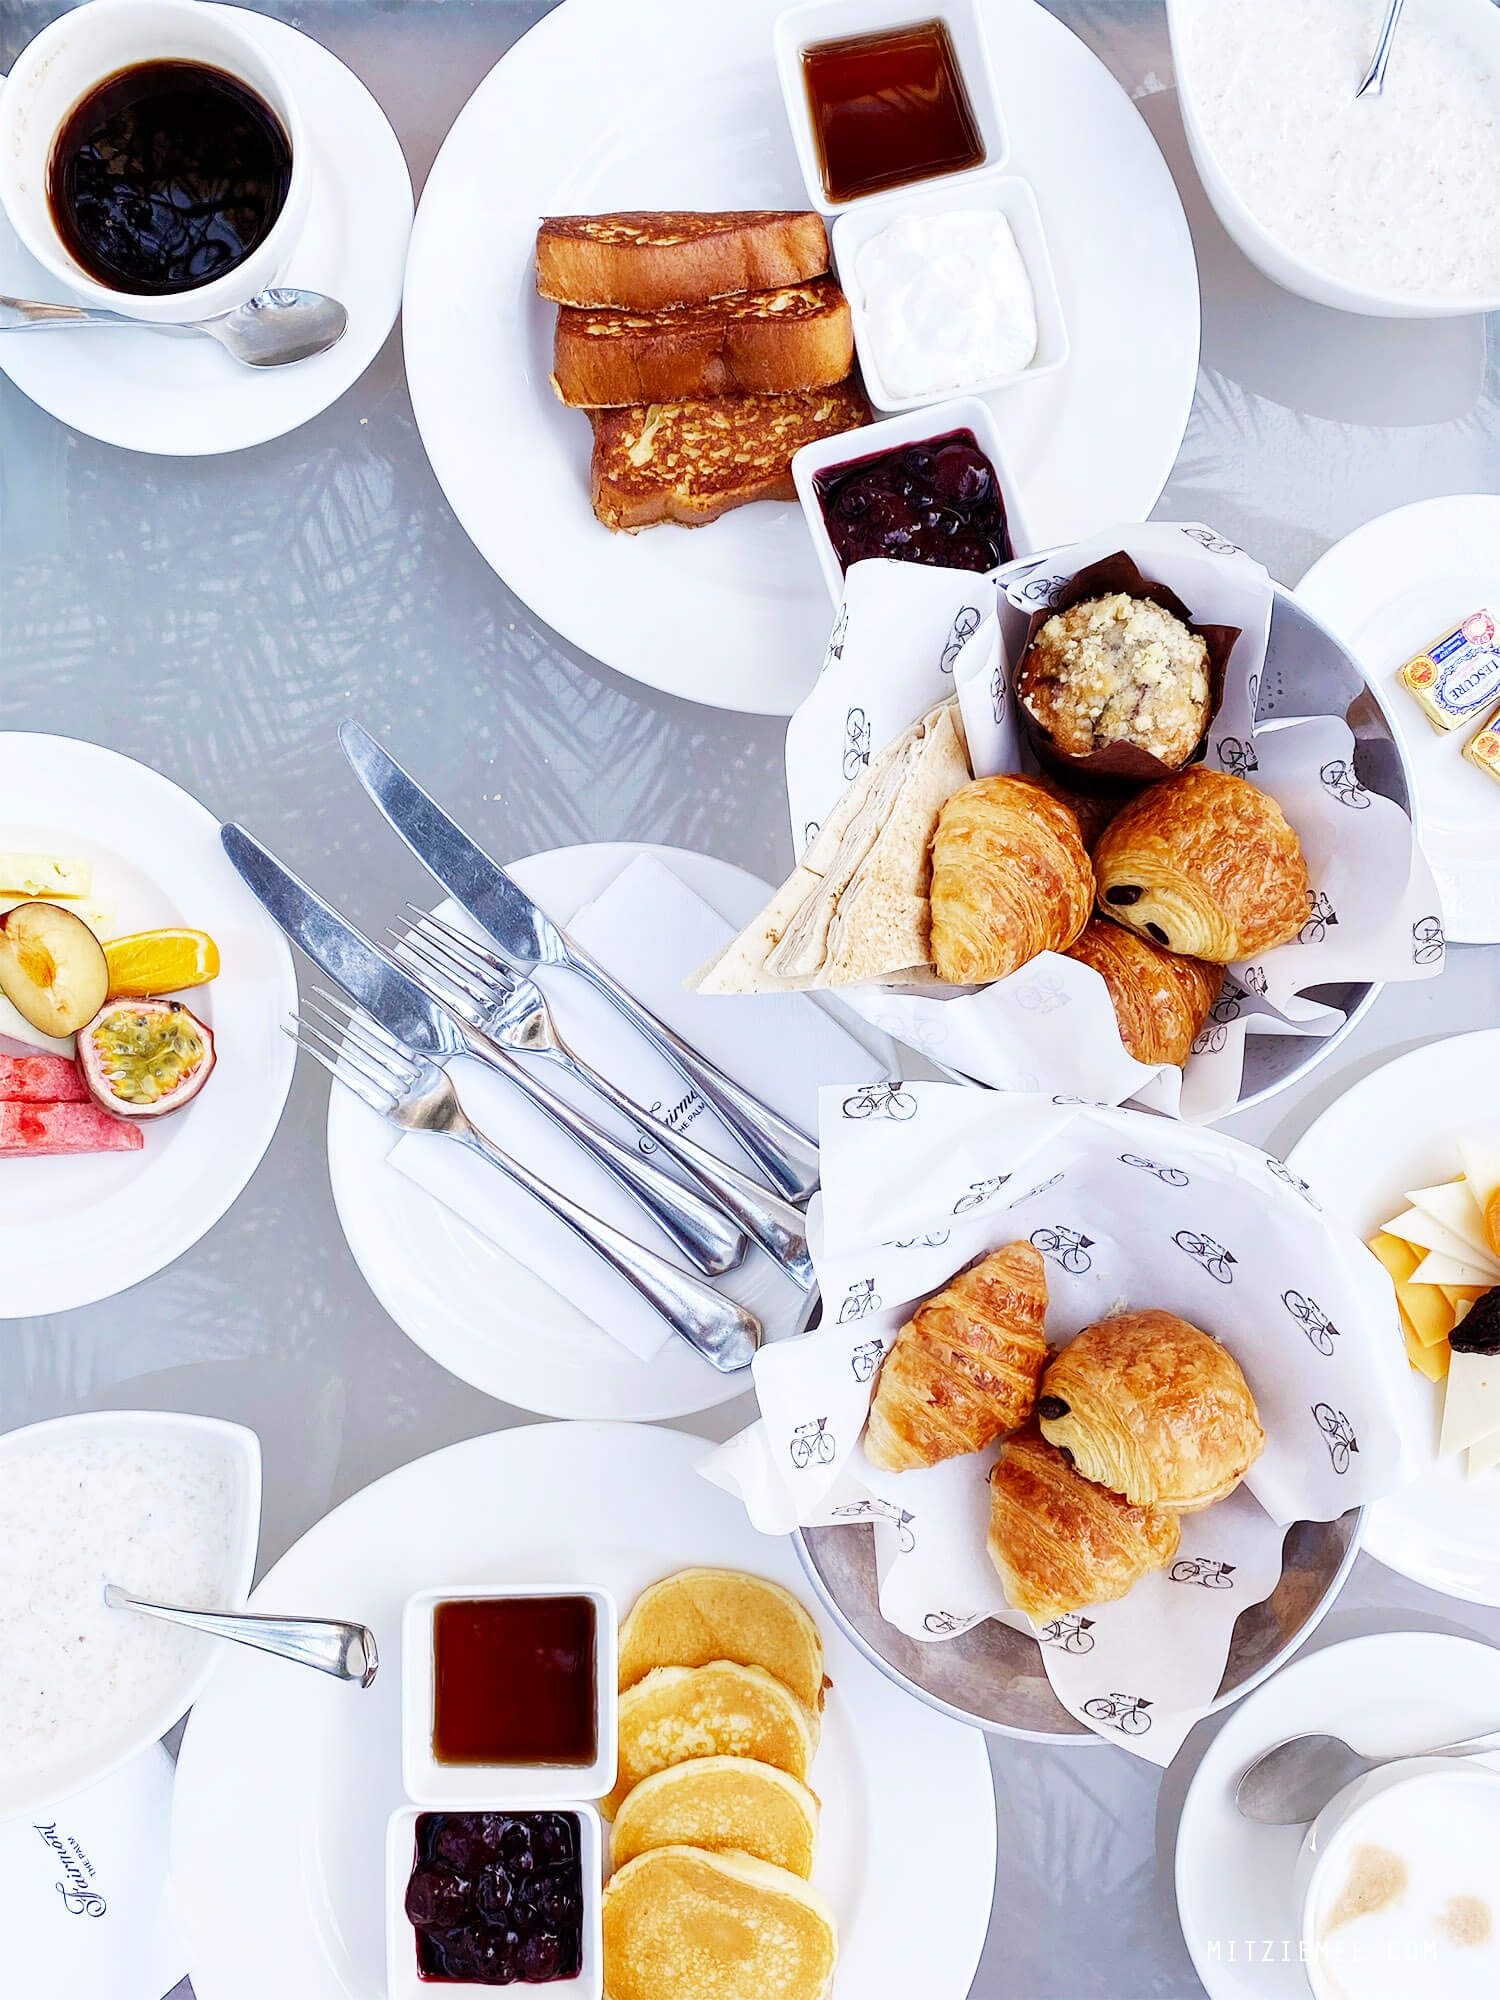 Fairmont The Palm Staycation I Dubai Dubai Blog Mitzie Mee Delicious Bread Breakfast Buffet Fairmont